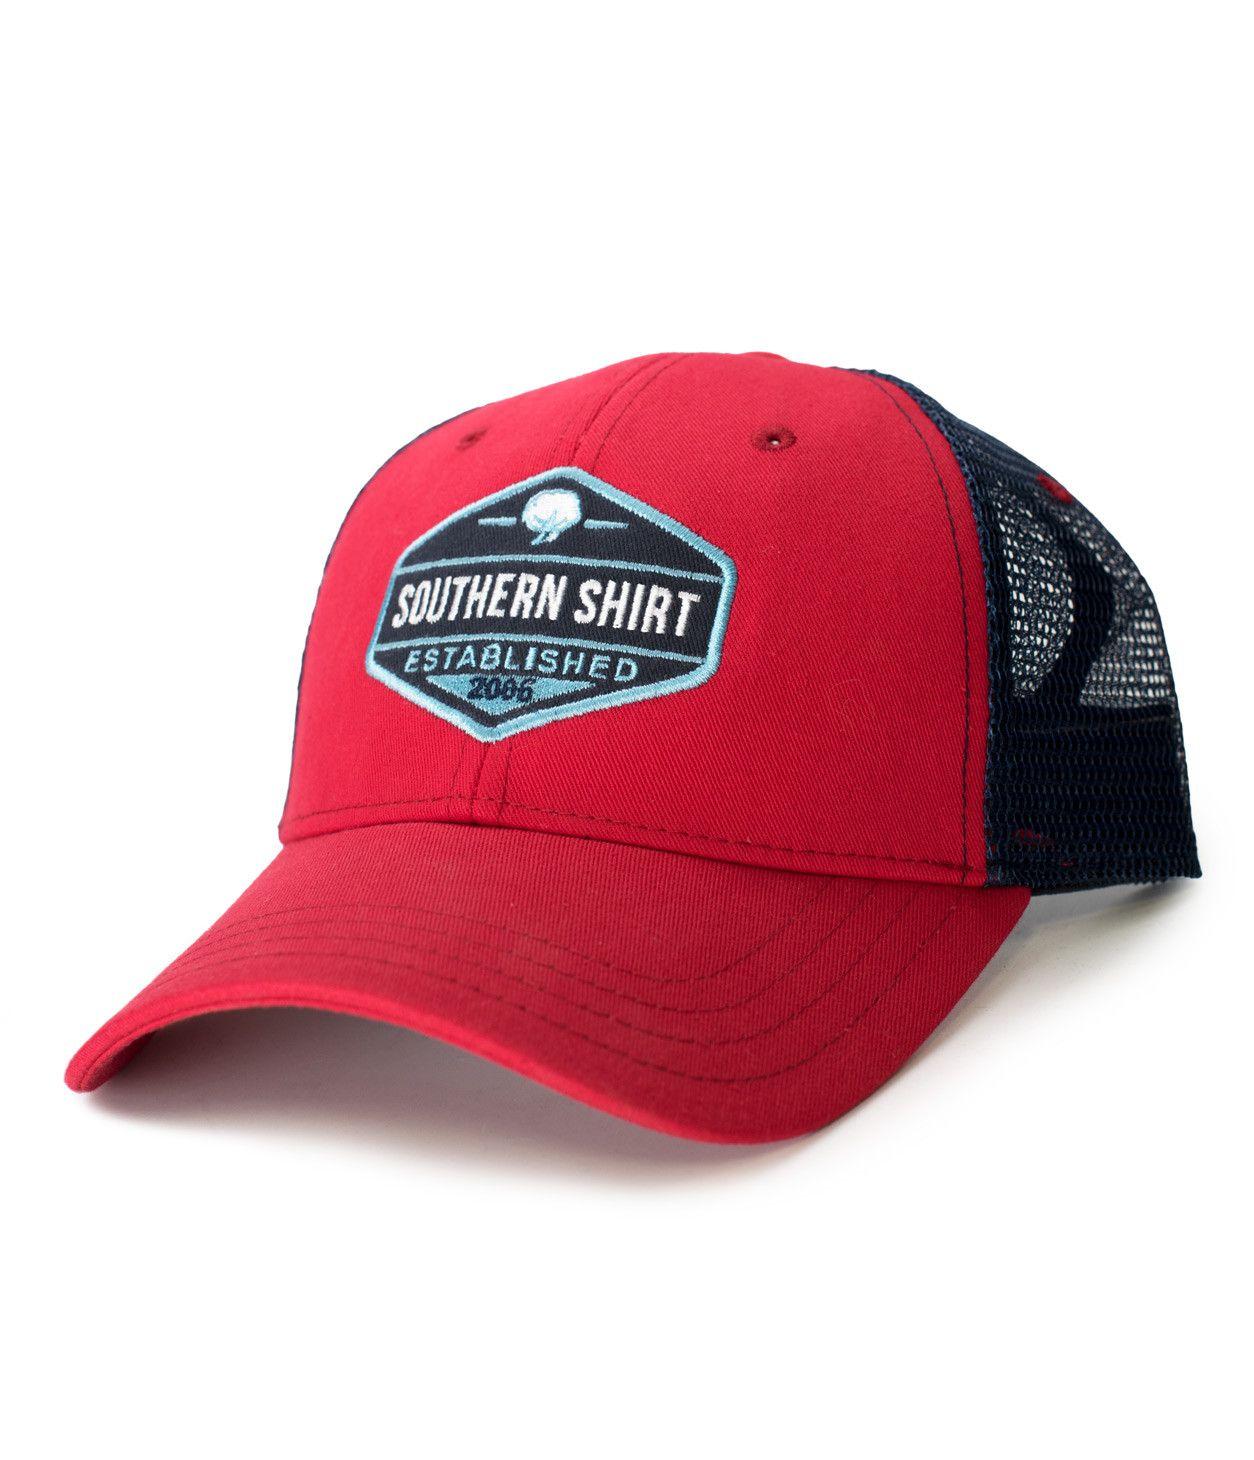 f4123b53ab1 Trademark Badge Mesh Hat. Trademark Badge Mesh Hat Southern Shirt